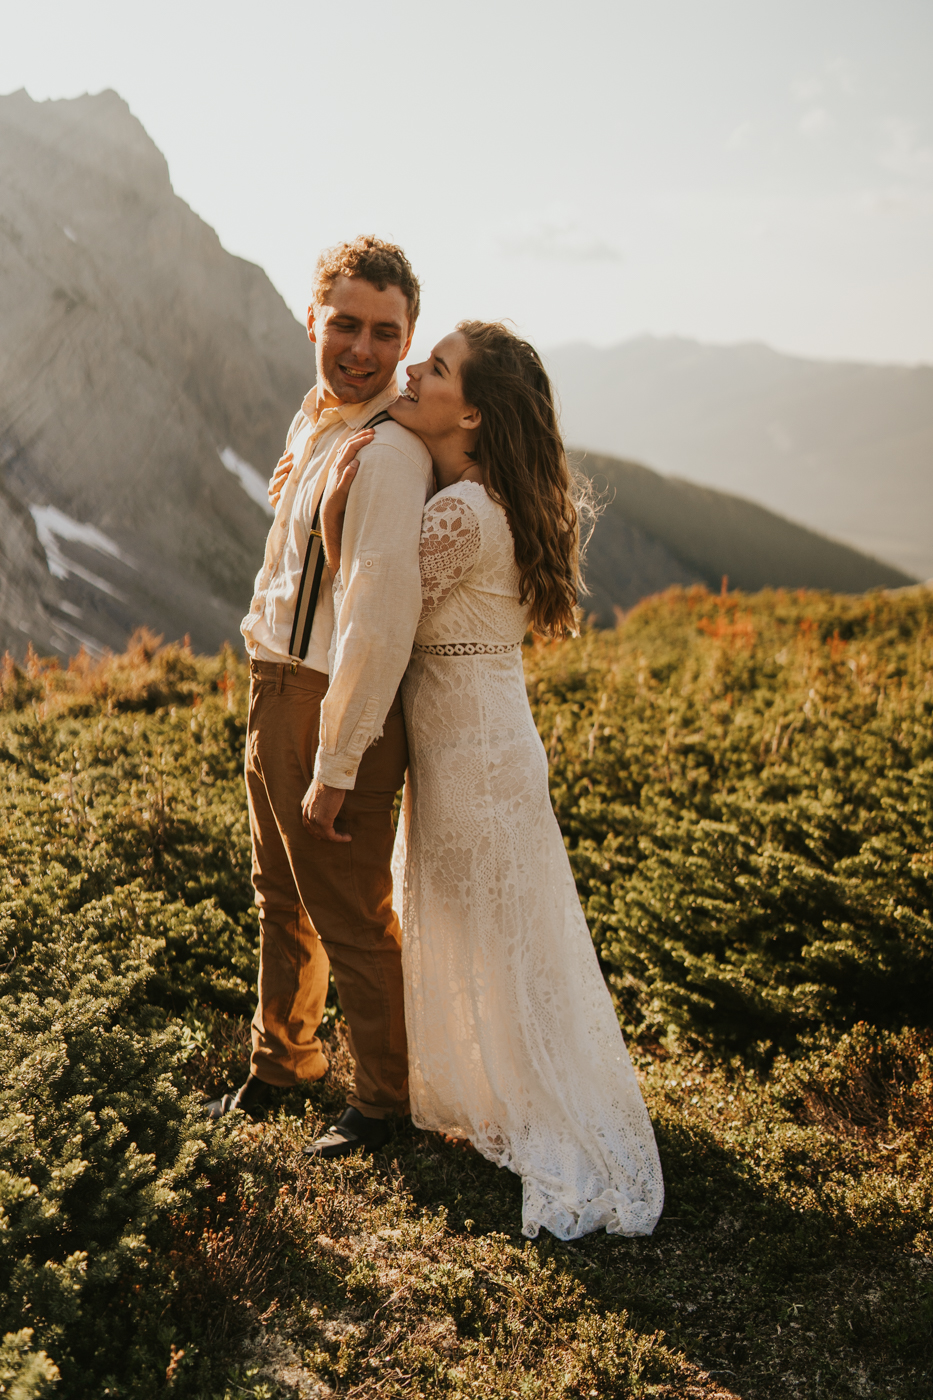 tyraephotography_photographer_wedding_elopement_engagement_photography-08371.jpg